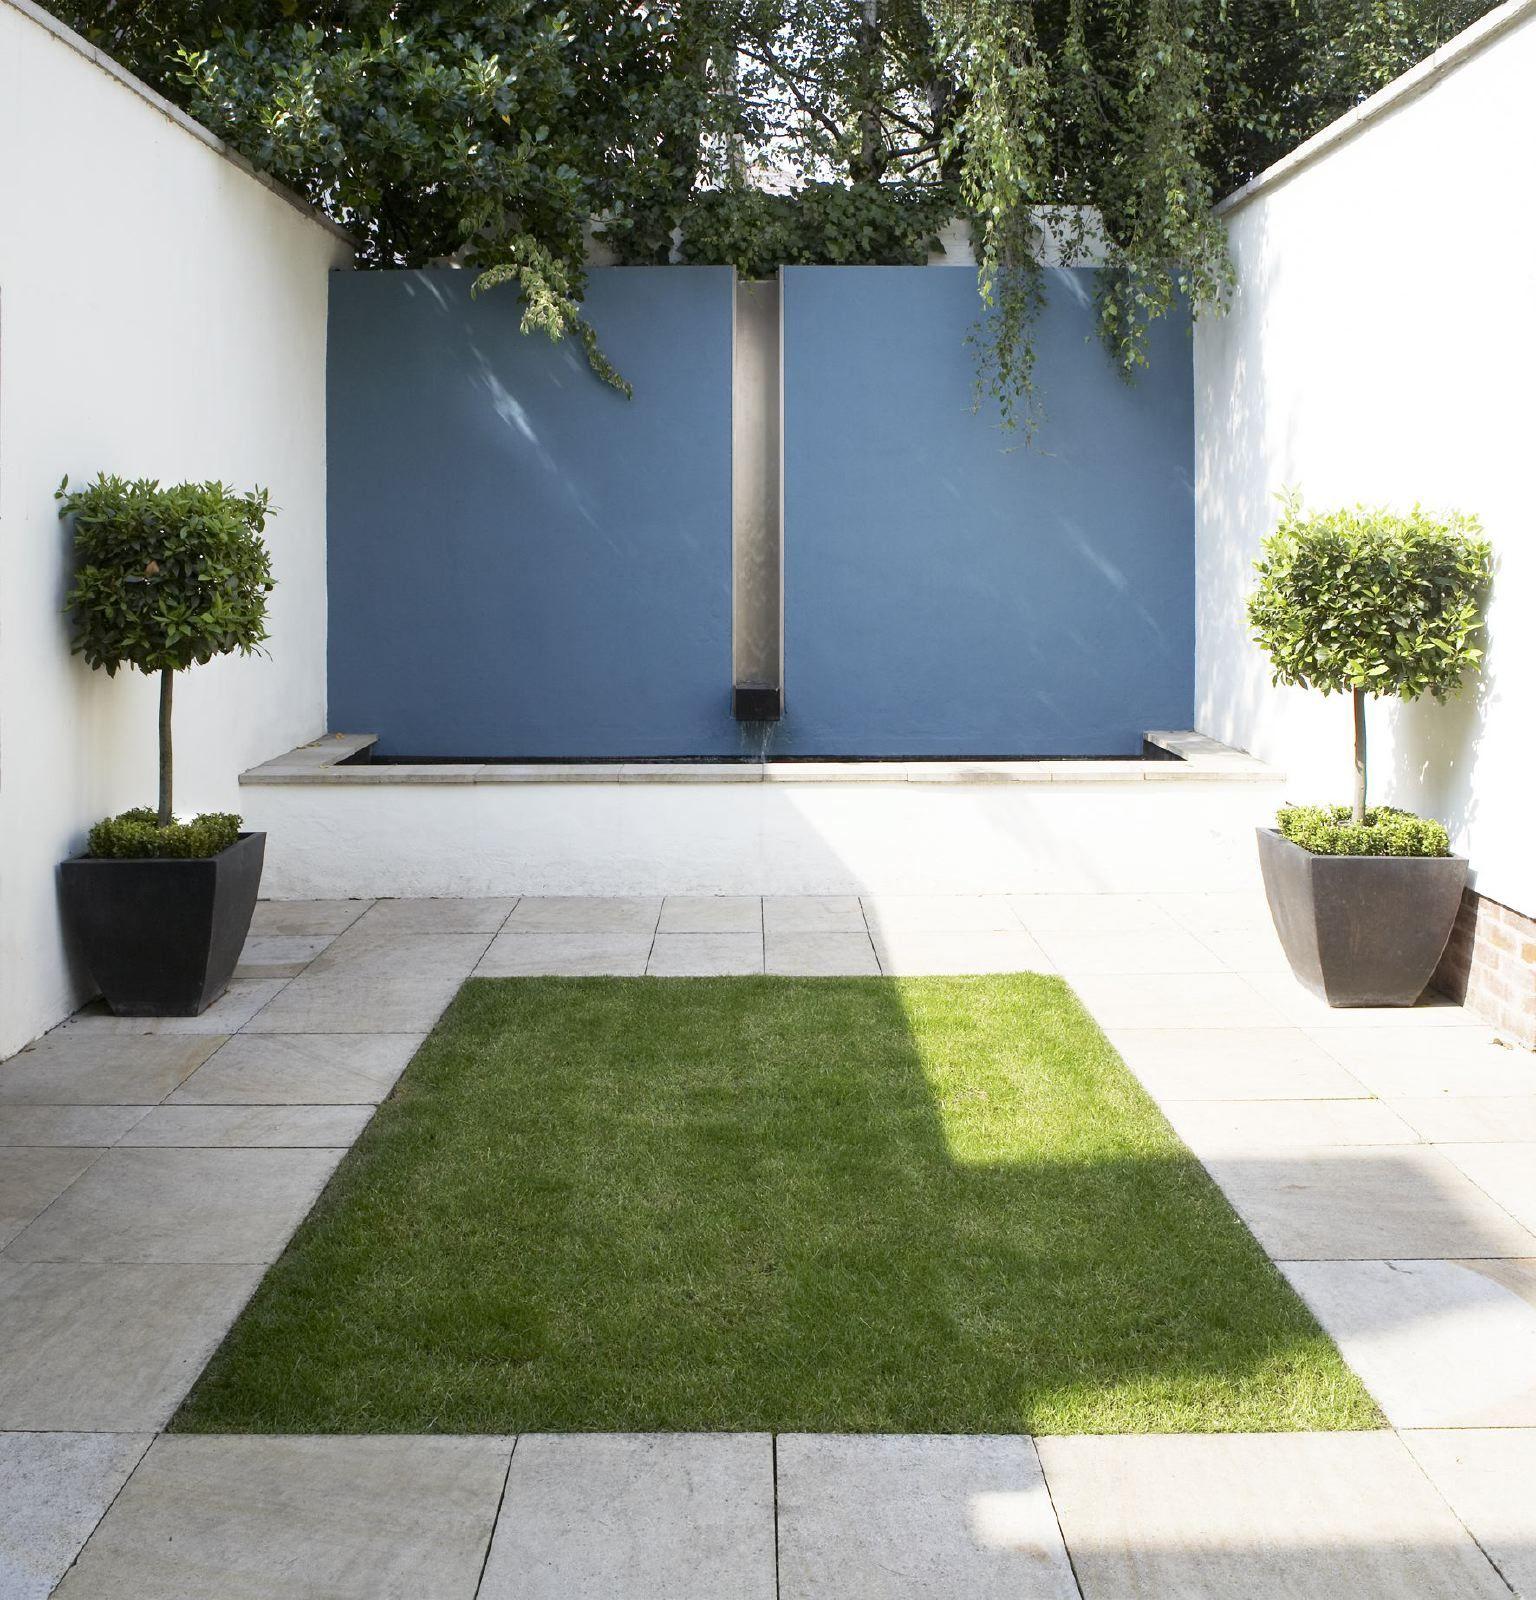 Interior Courtyard Garden Home: Architecturally Minimal Courtyard With Pond